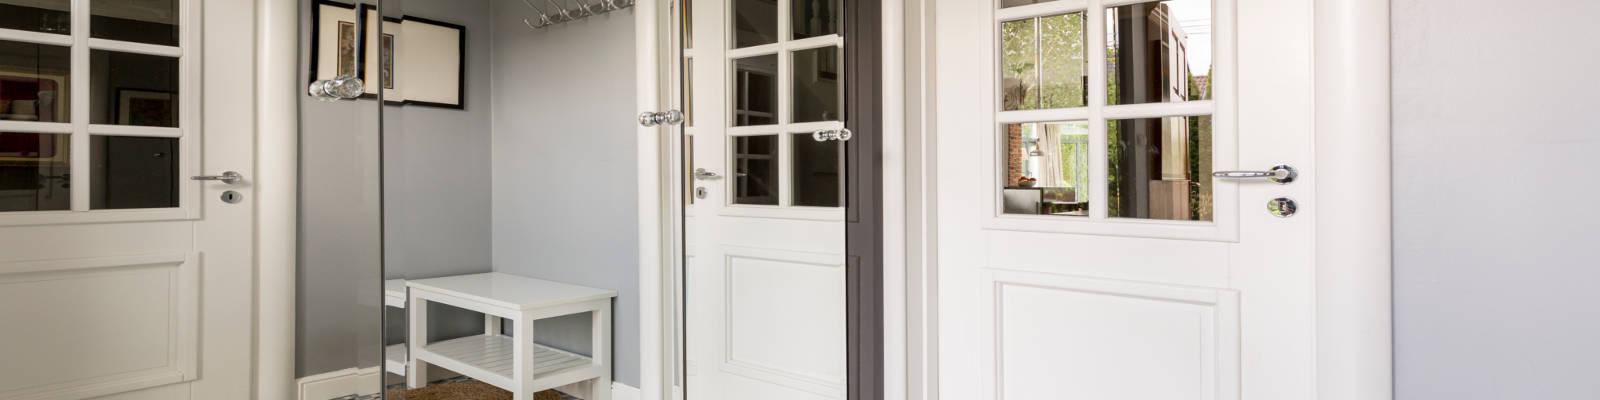 LMT Design - Türen